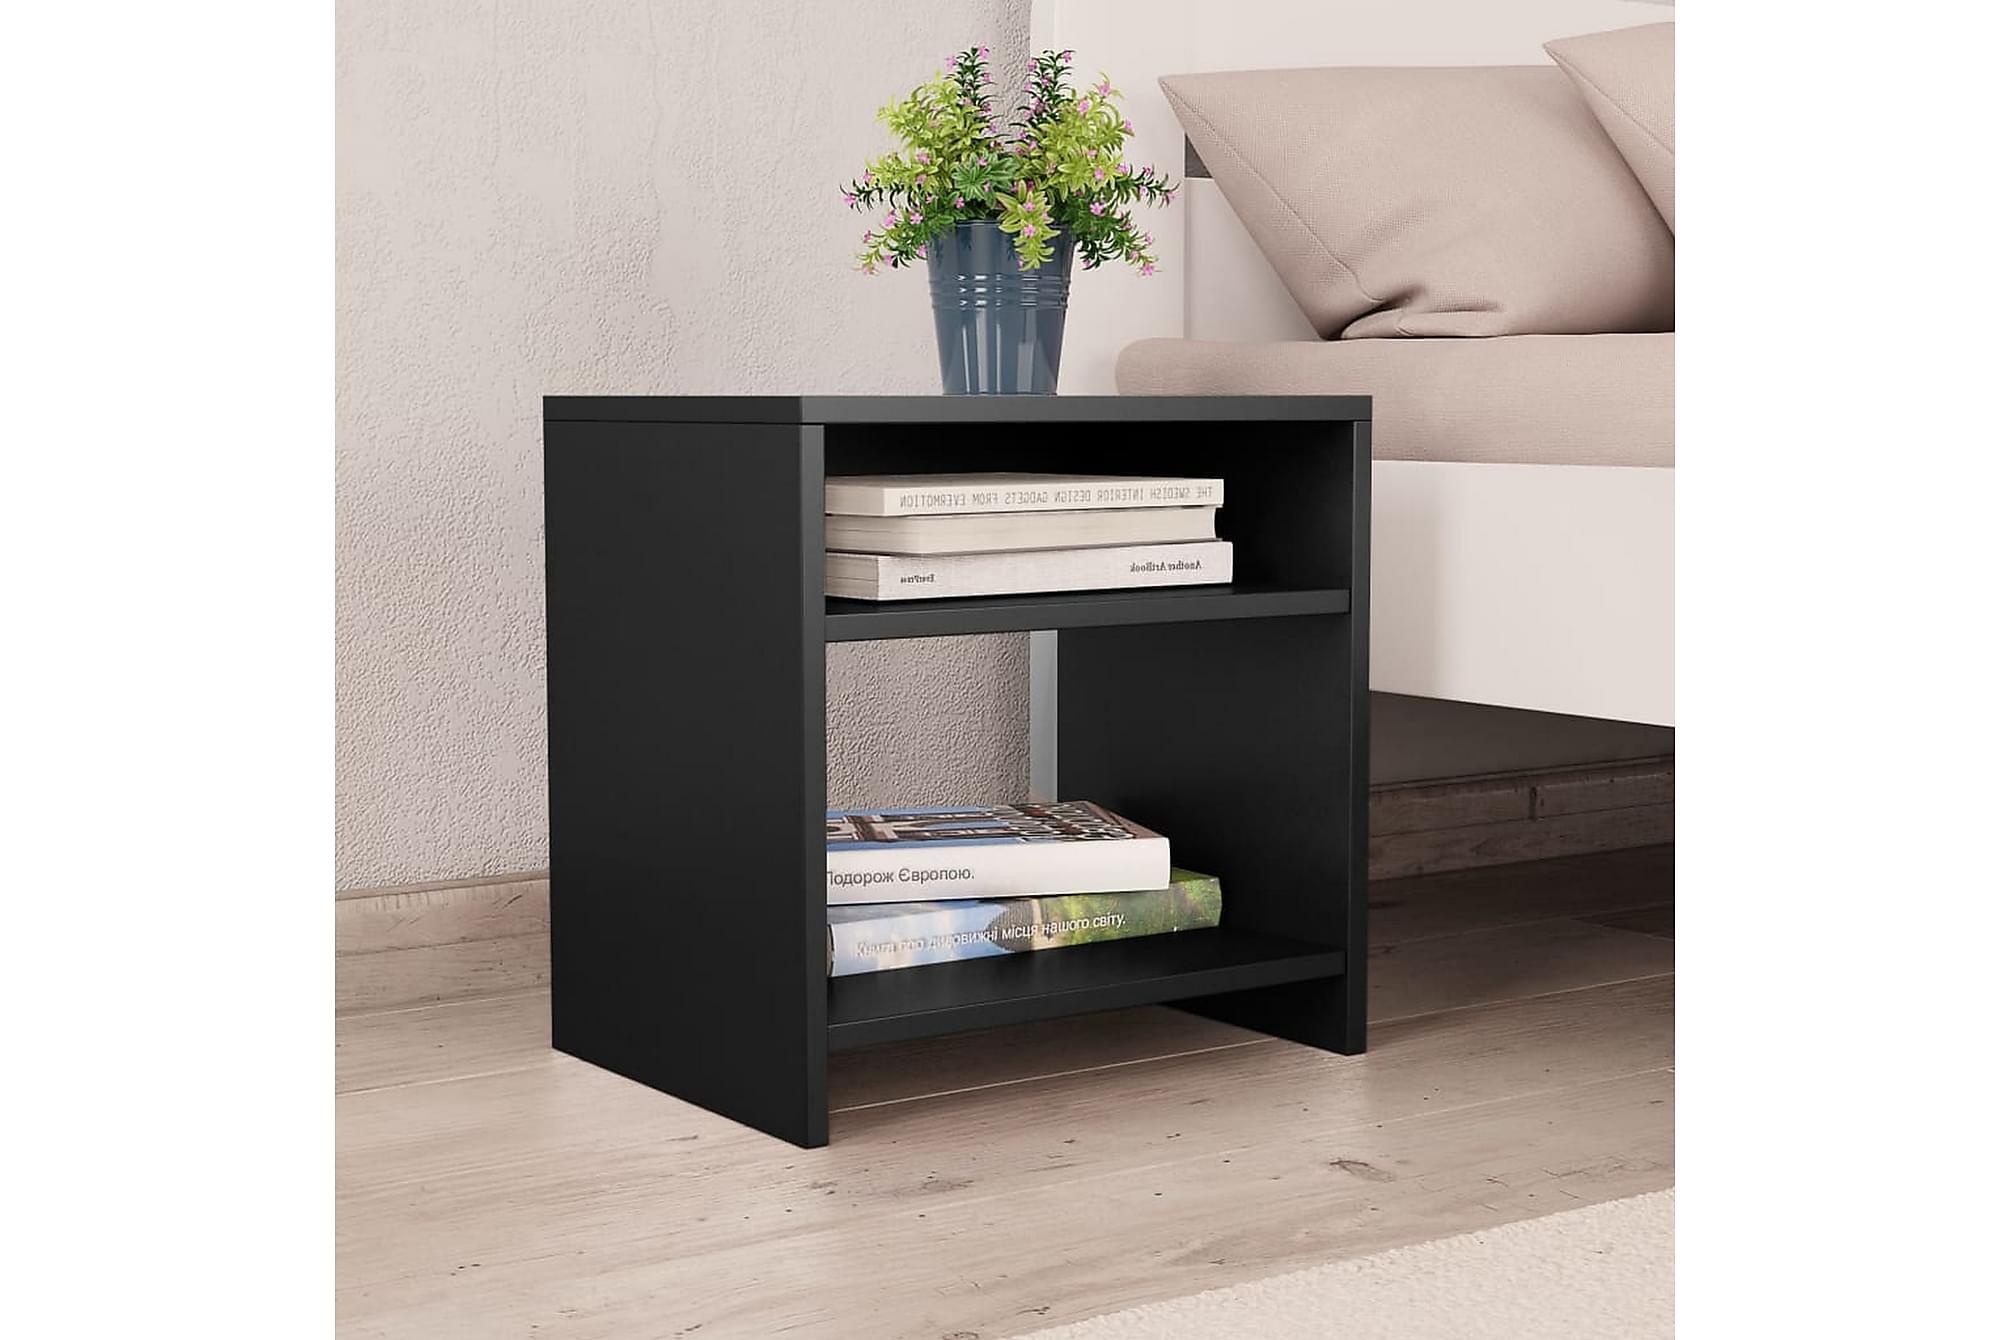 Sängbord svart 40x30x40 cm spånskiva